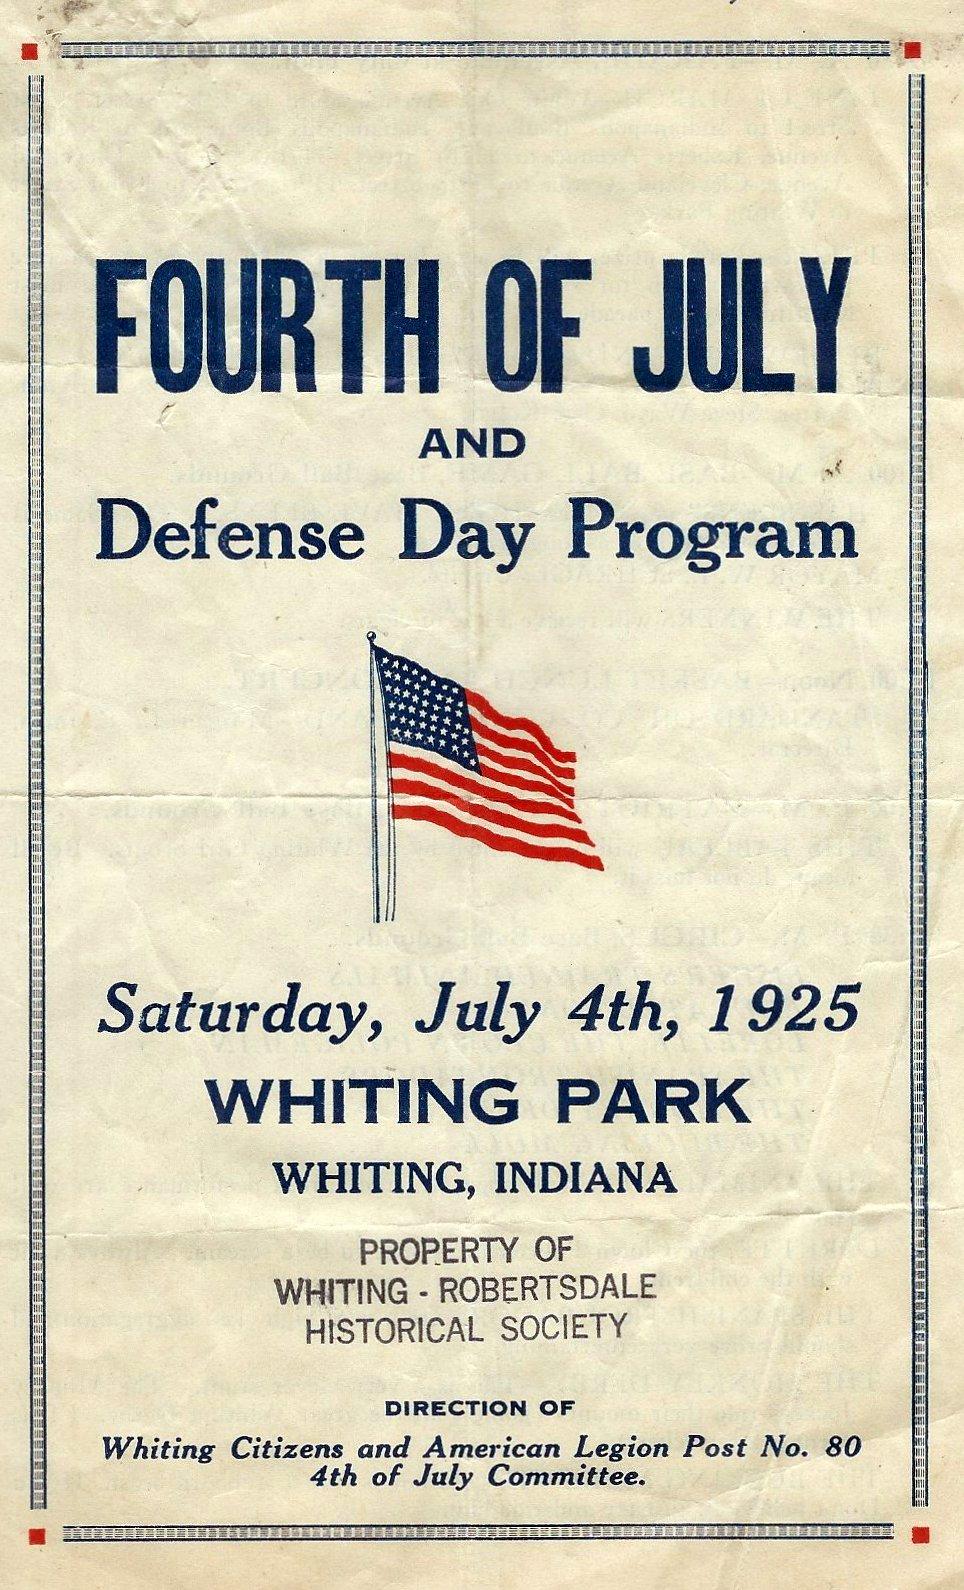 4th of July 1925 Program.jpg